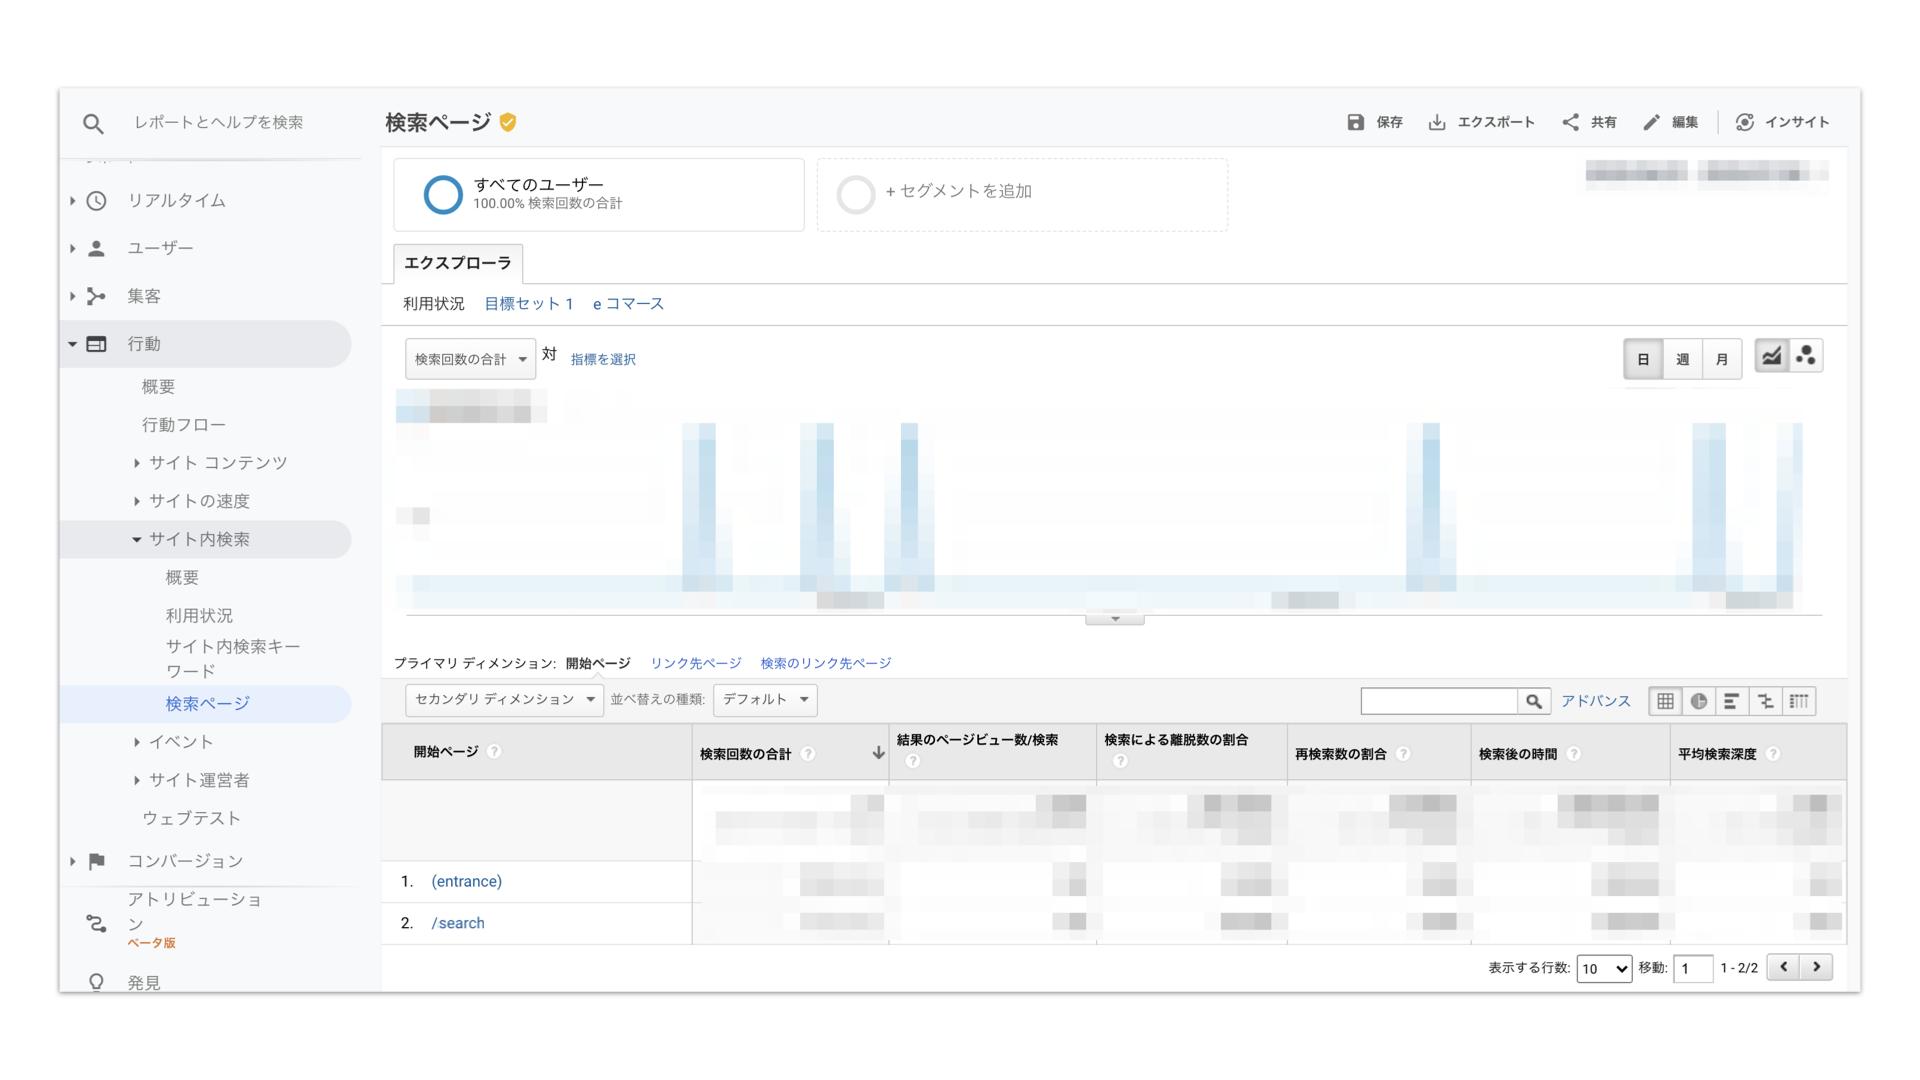 ga-site-search-sample-page